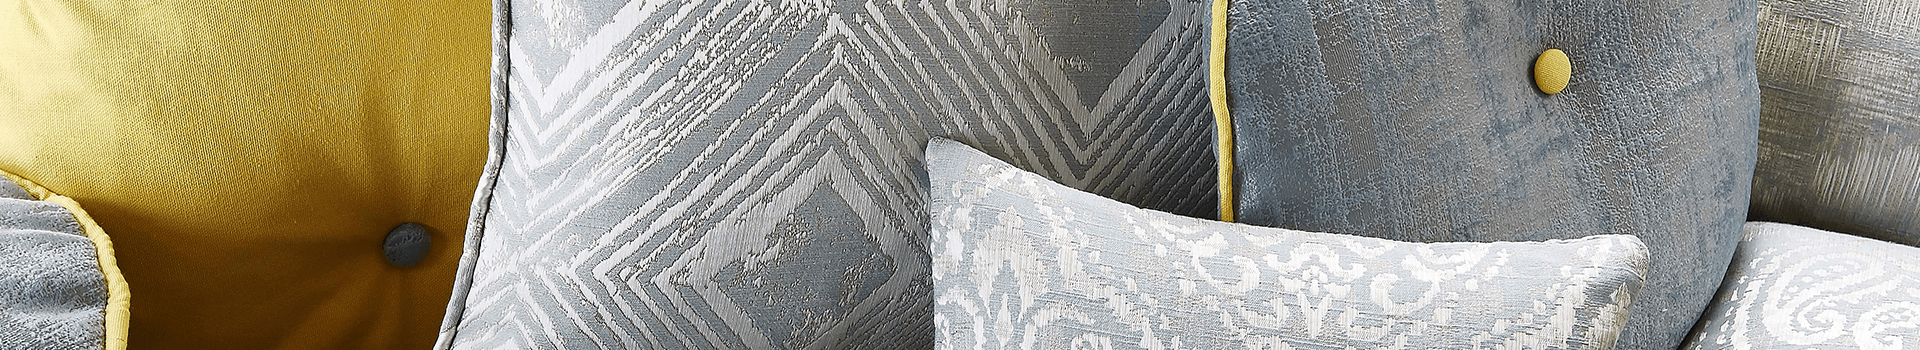 Interieur- en meubelstoffen